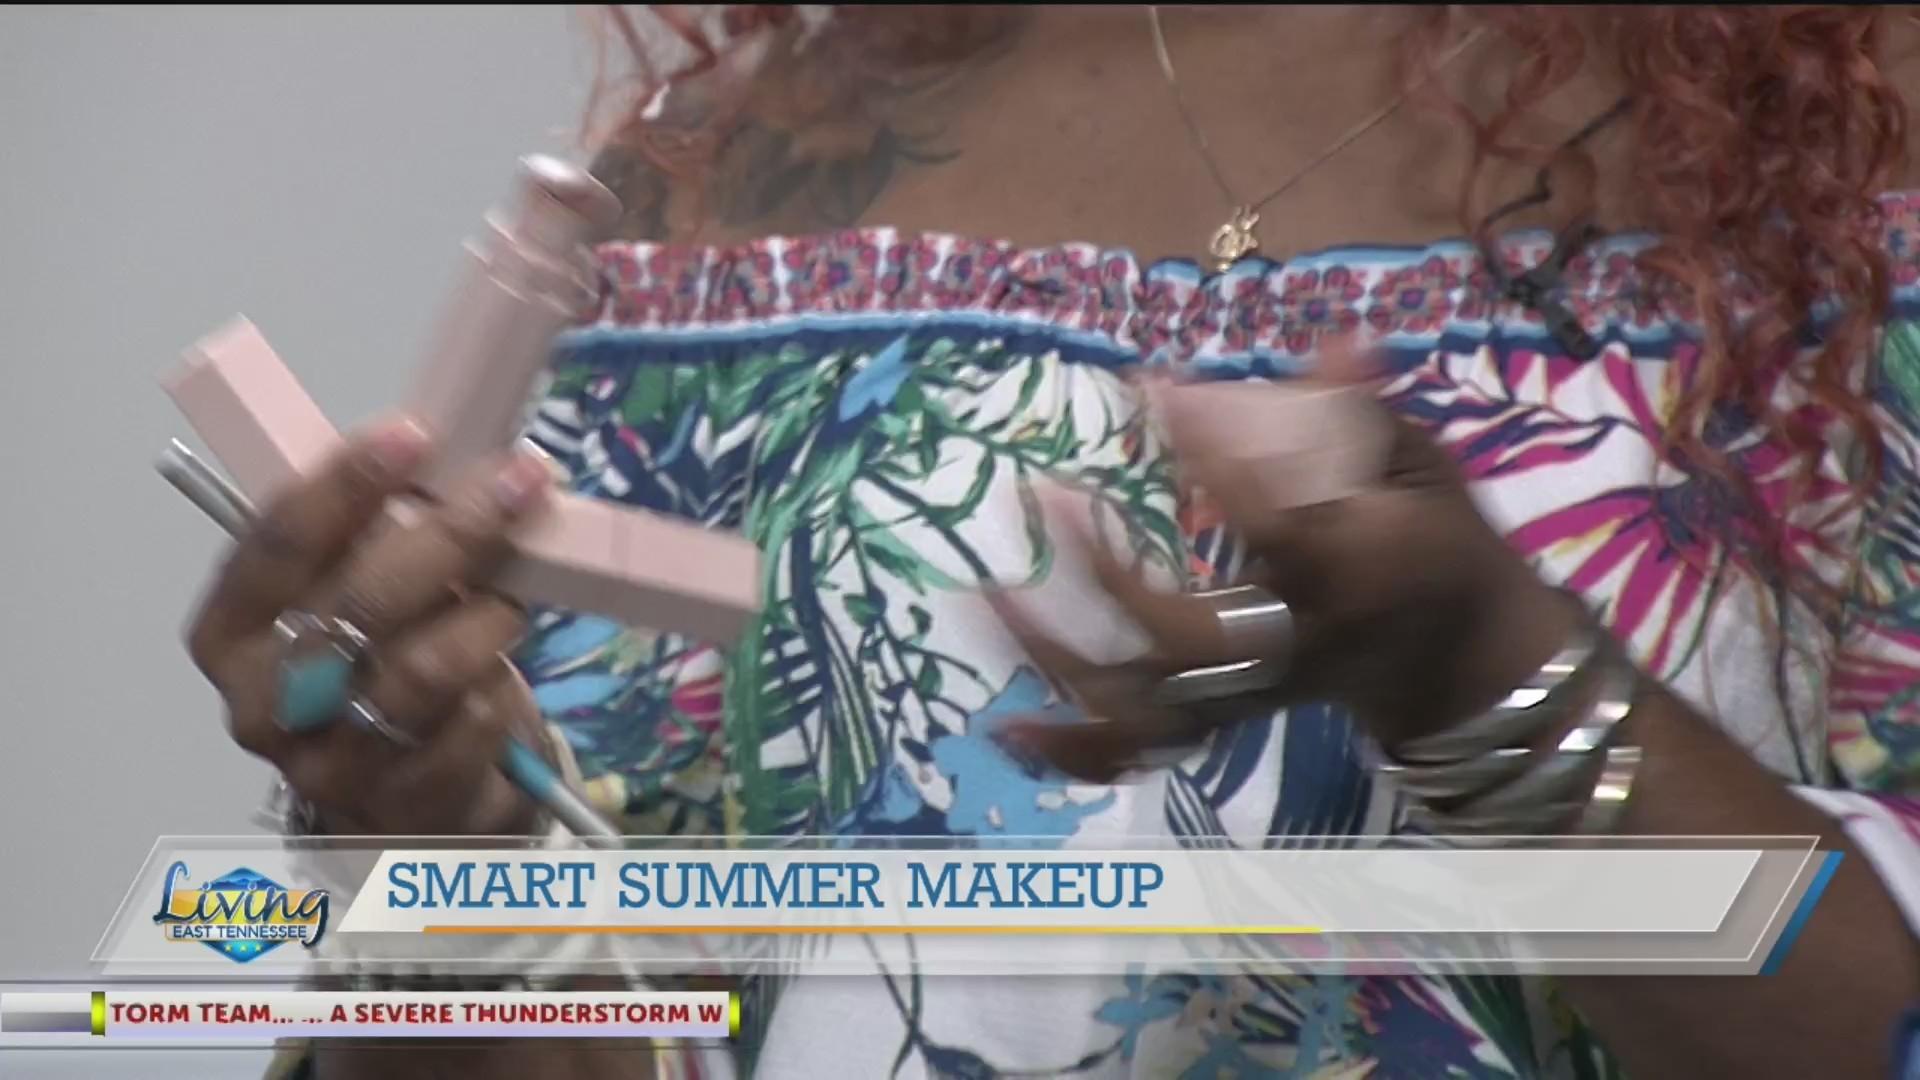 Beauty influencer K.C. Coleman gives us smart, summer makeup tips